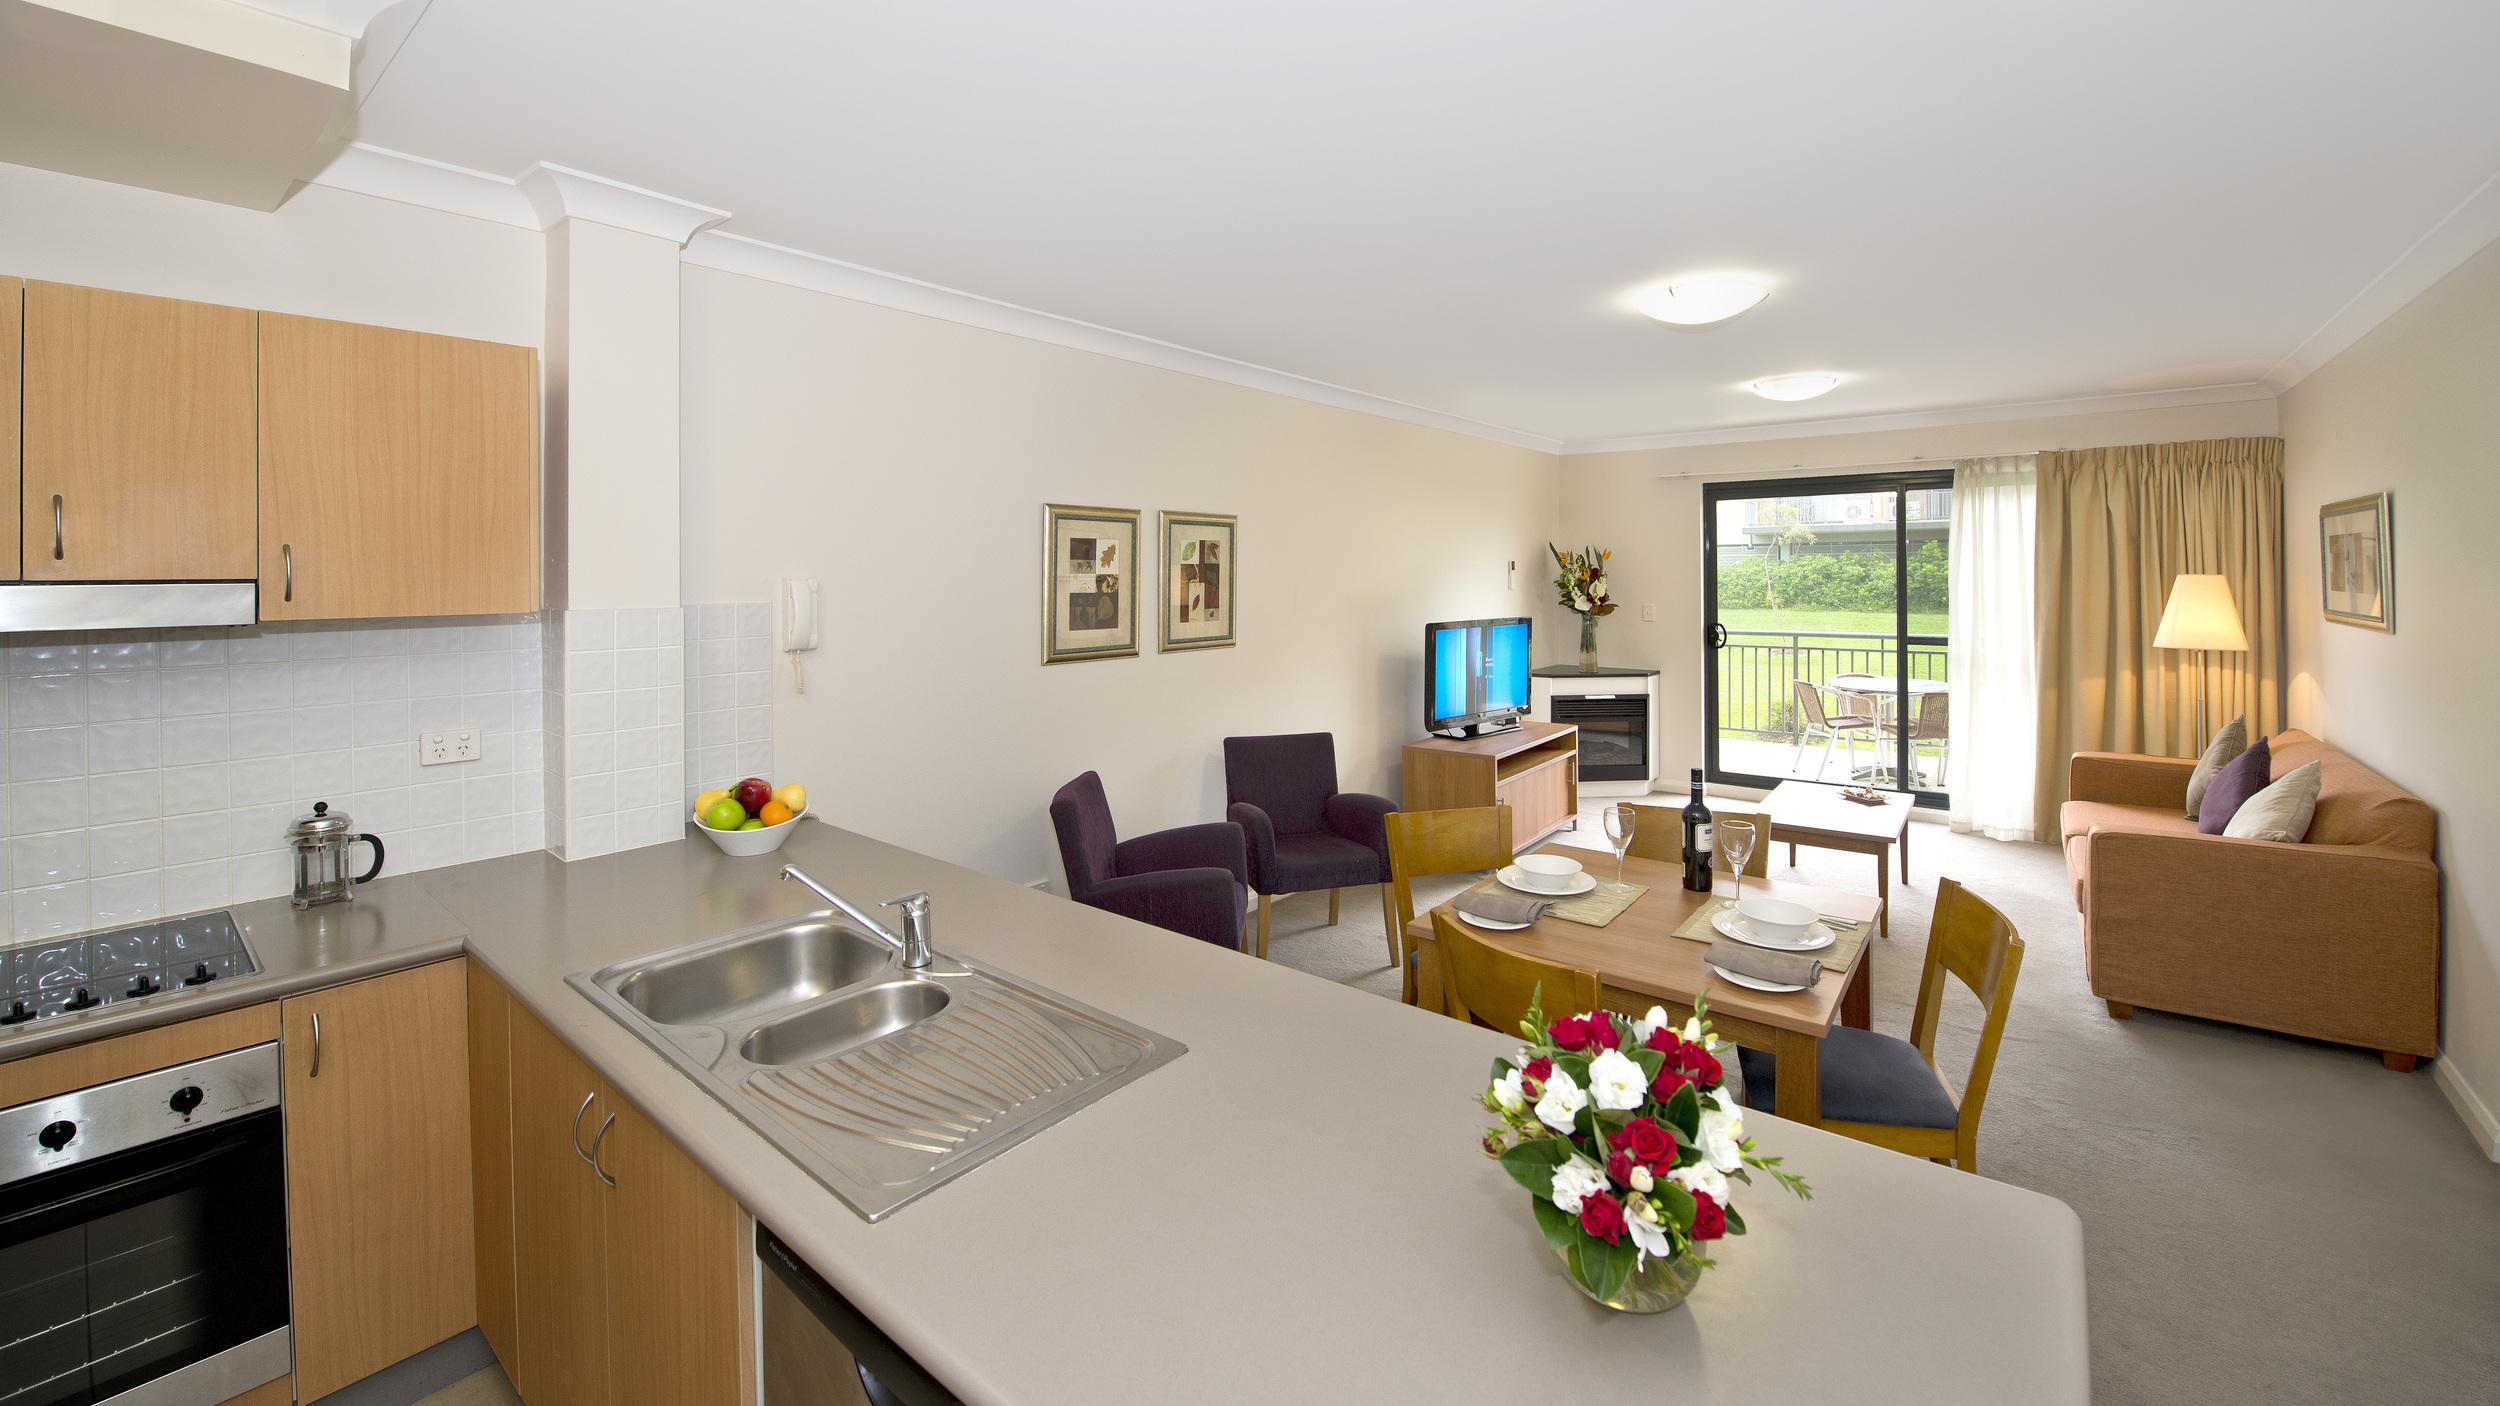 LISP_One_Bedroom_Apartment_Apr_Living_Room_14_3.jpg